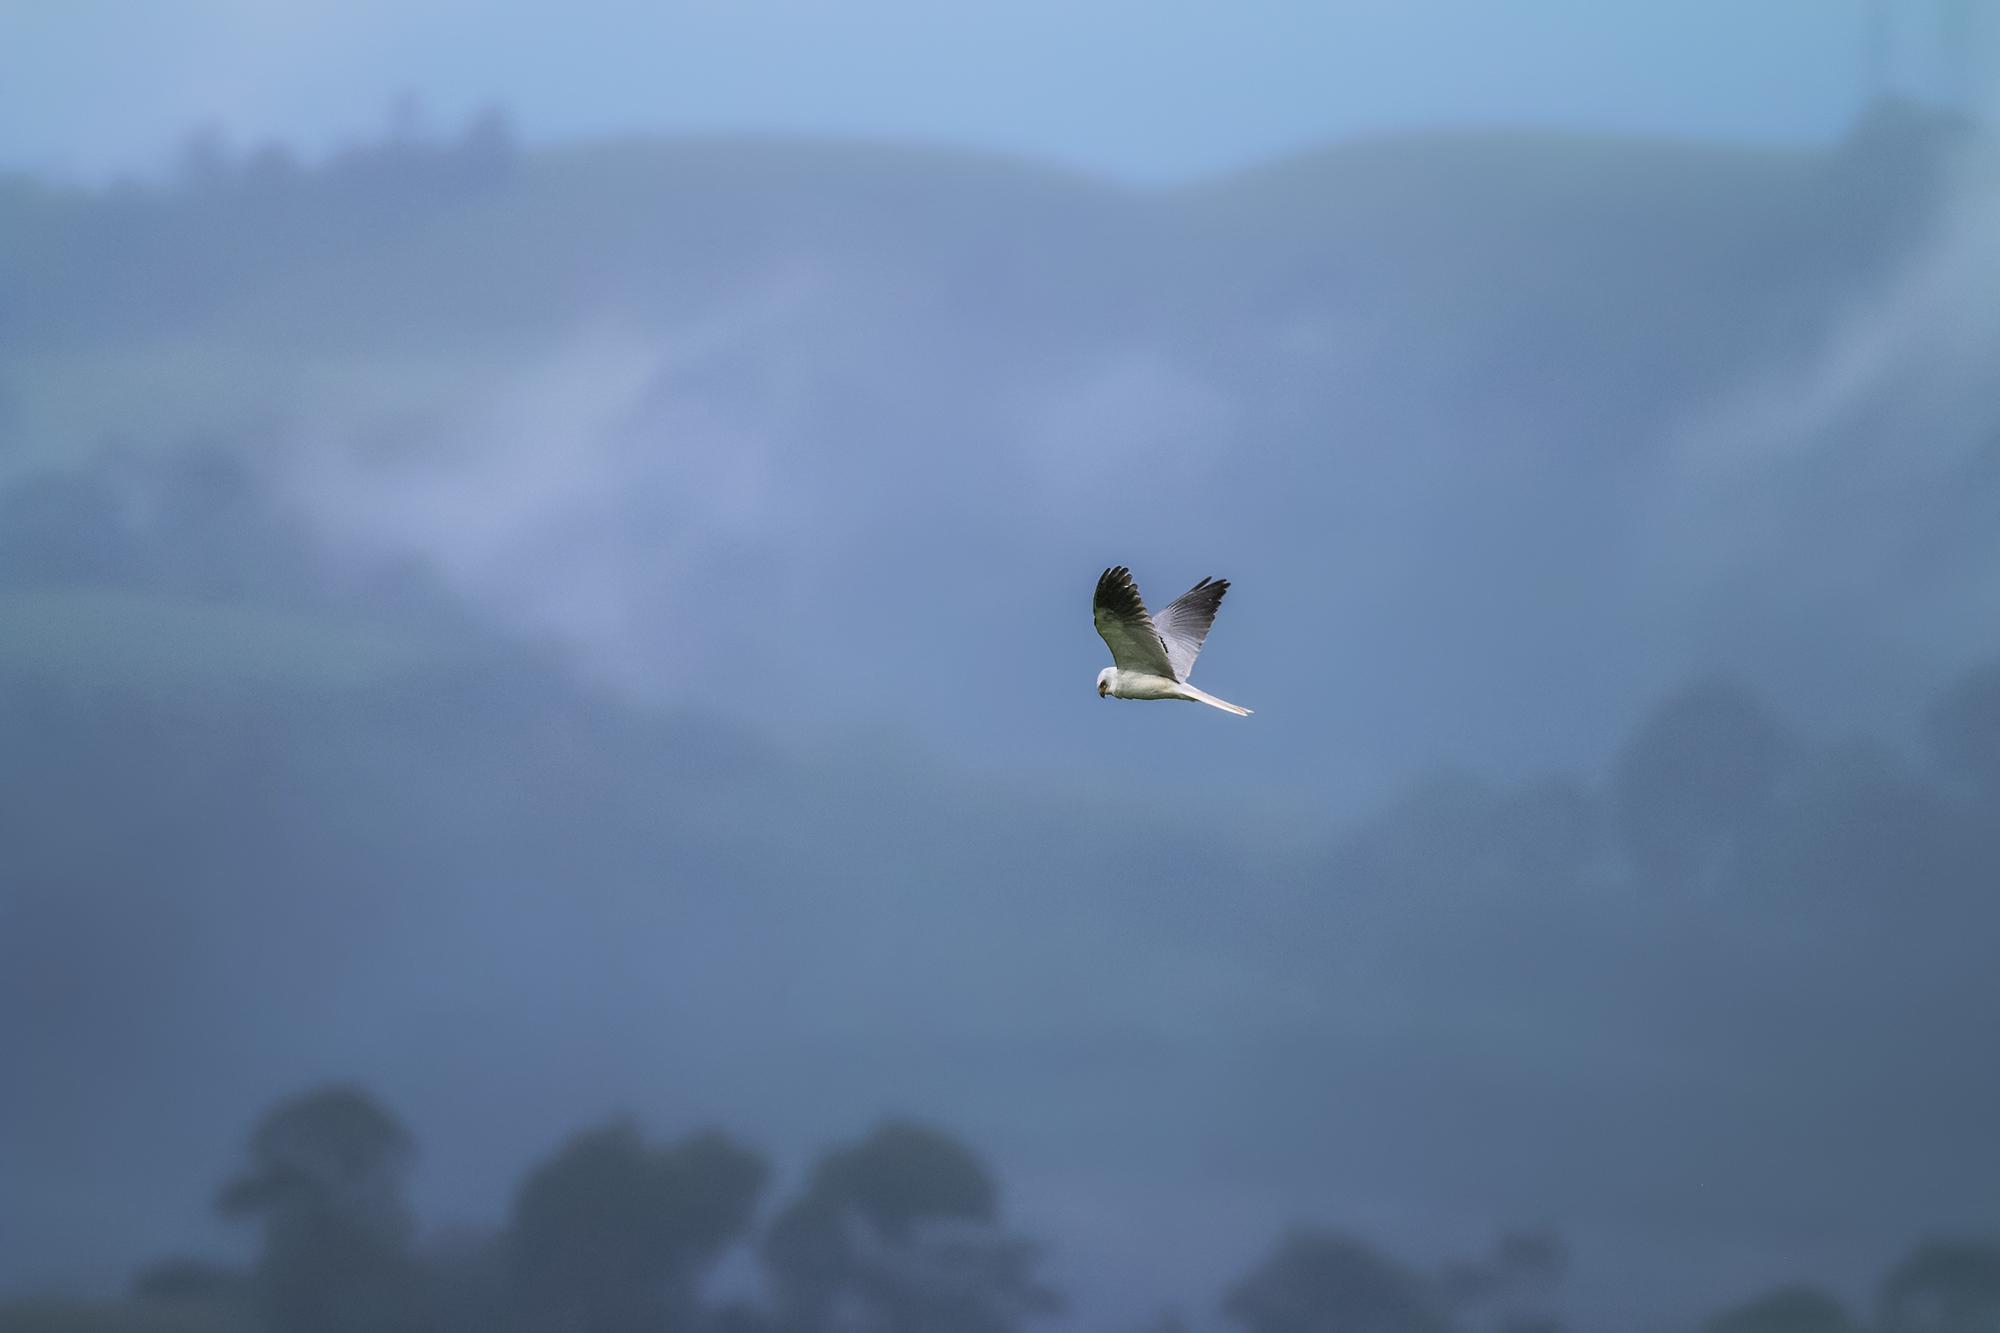 White-winged-Kite-JPEG_web.jpg